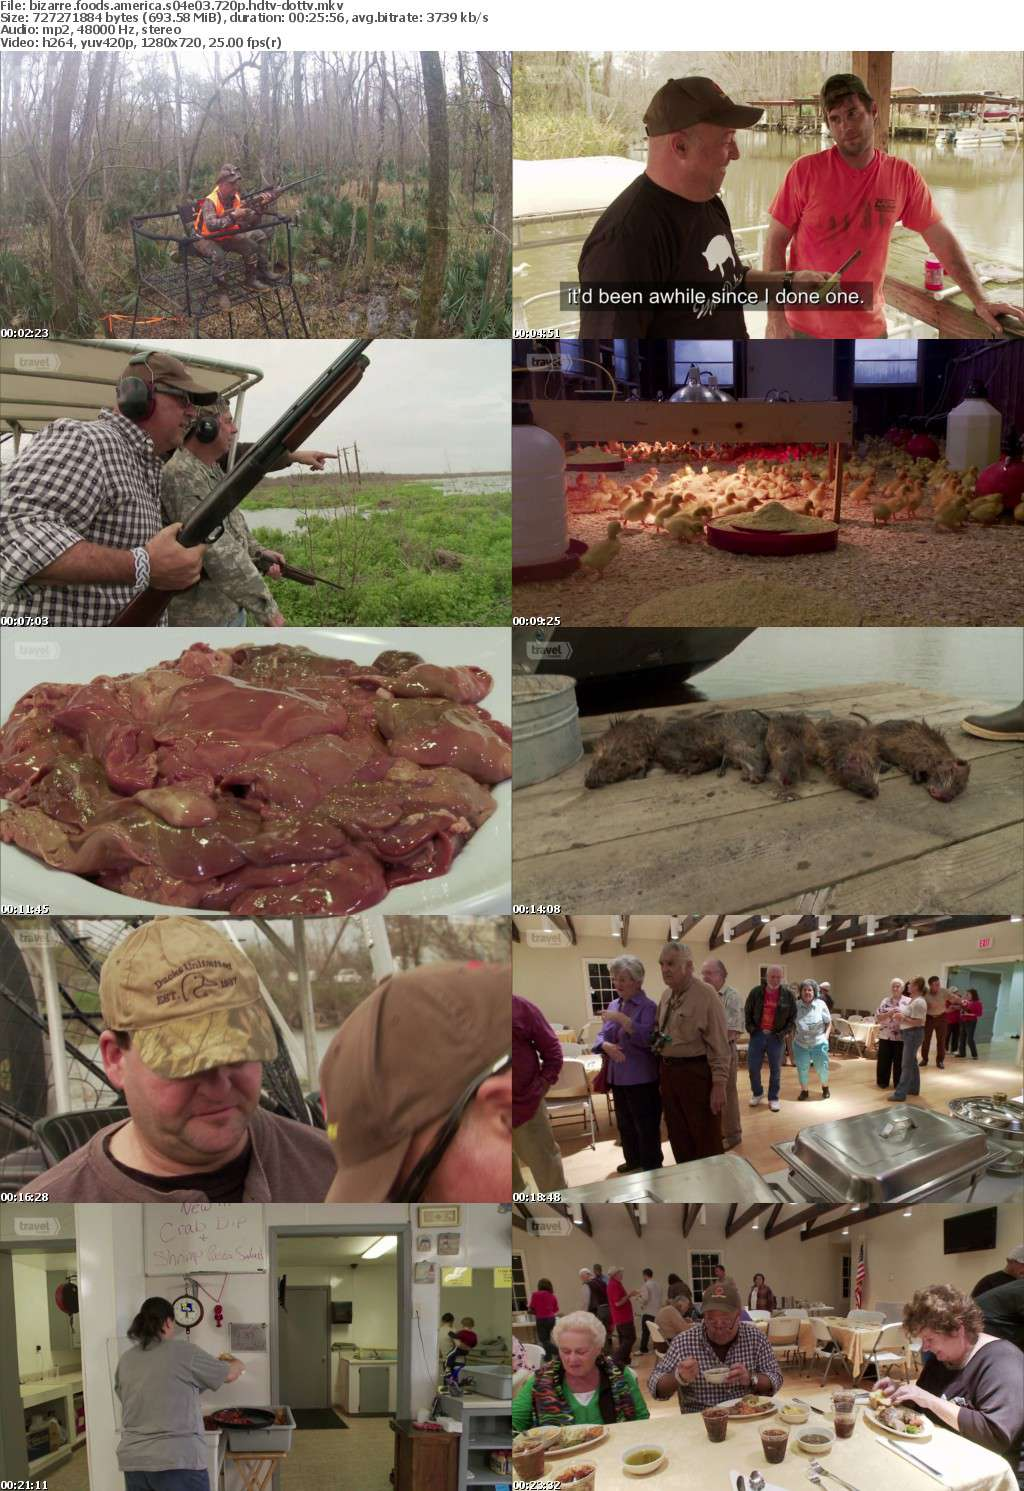 Bizarre Foods America S04E03 720p HDTV x264-dotTV